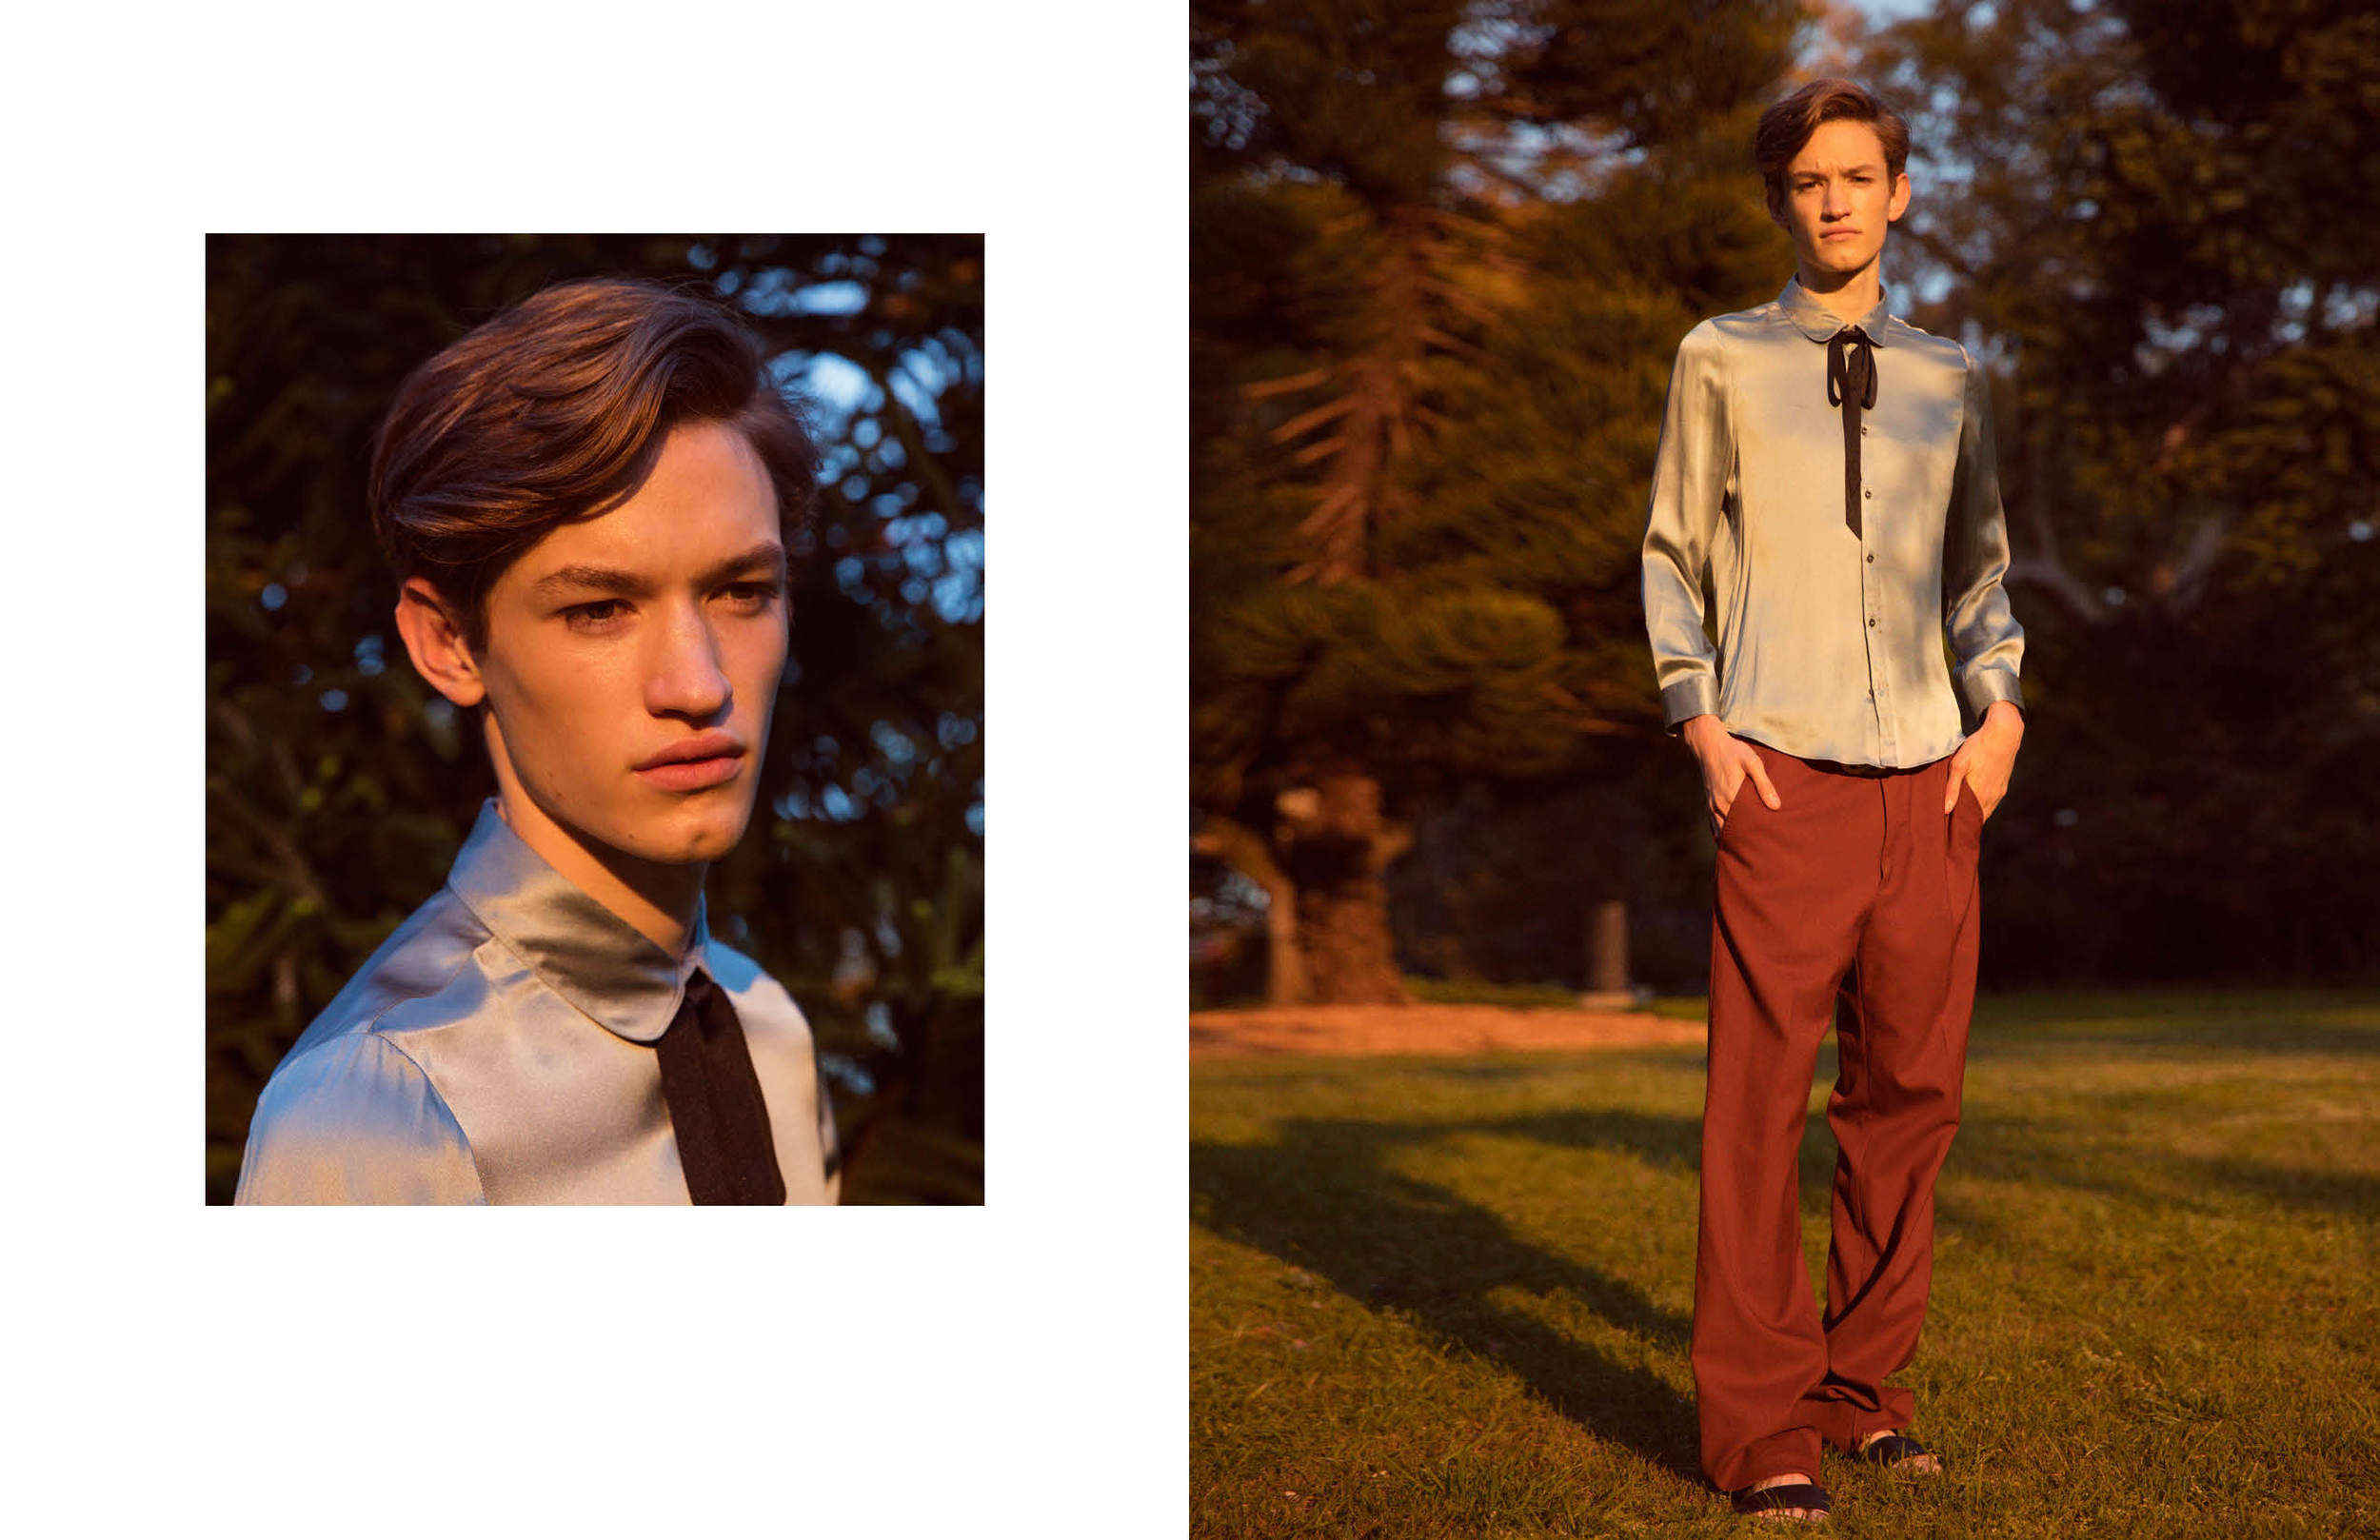 Rowan wears Gucci silk shirt, Gucci trousers, Gucci sandals